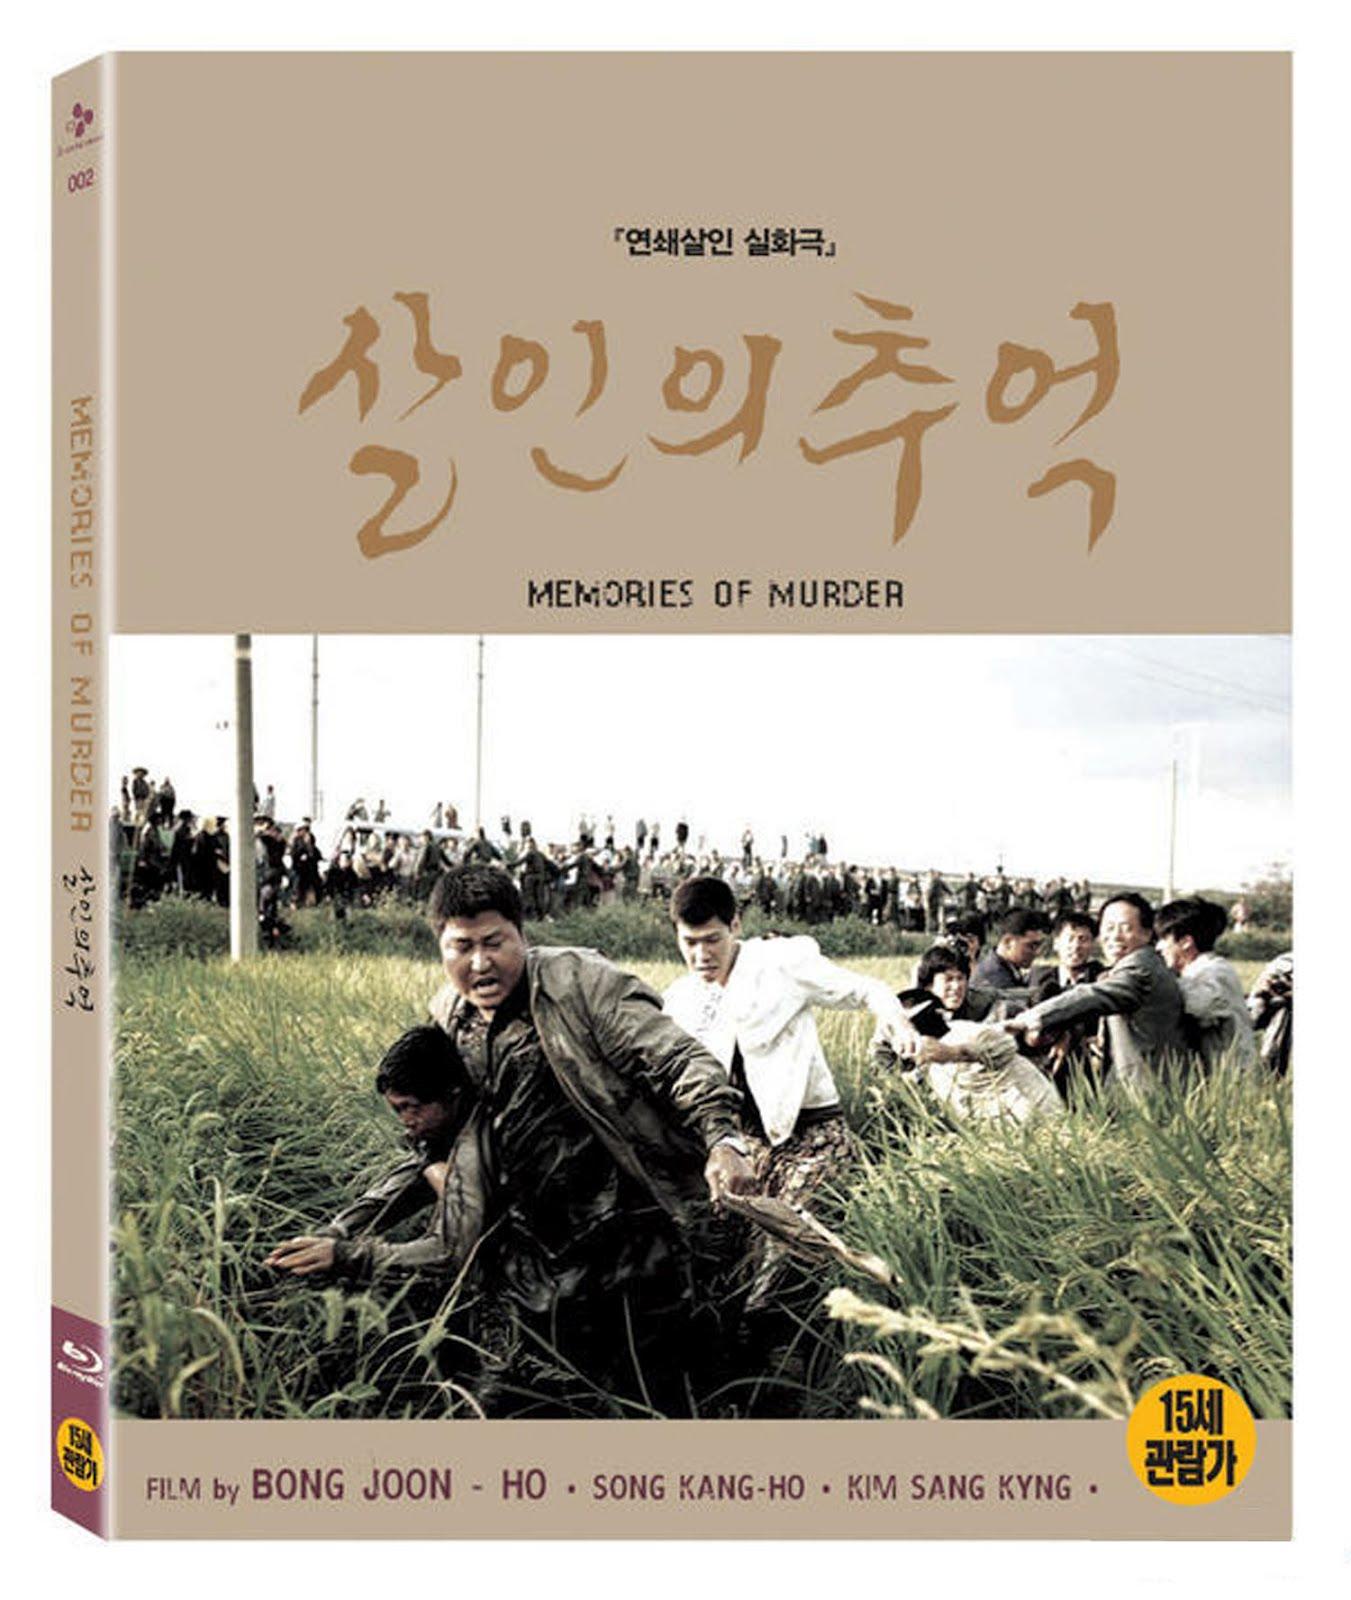 memories-of-murder-salinui-chueok-dvd-case-box